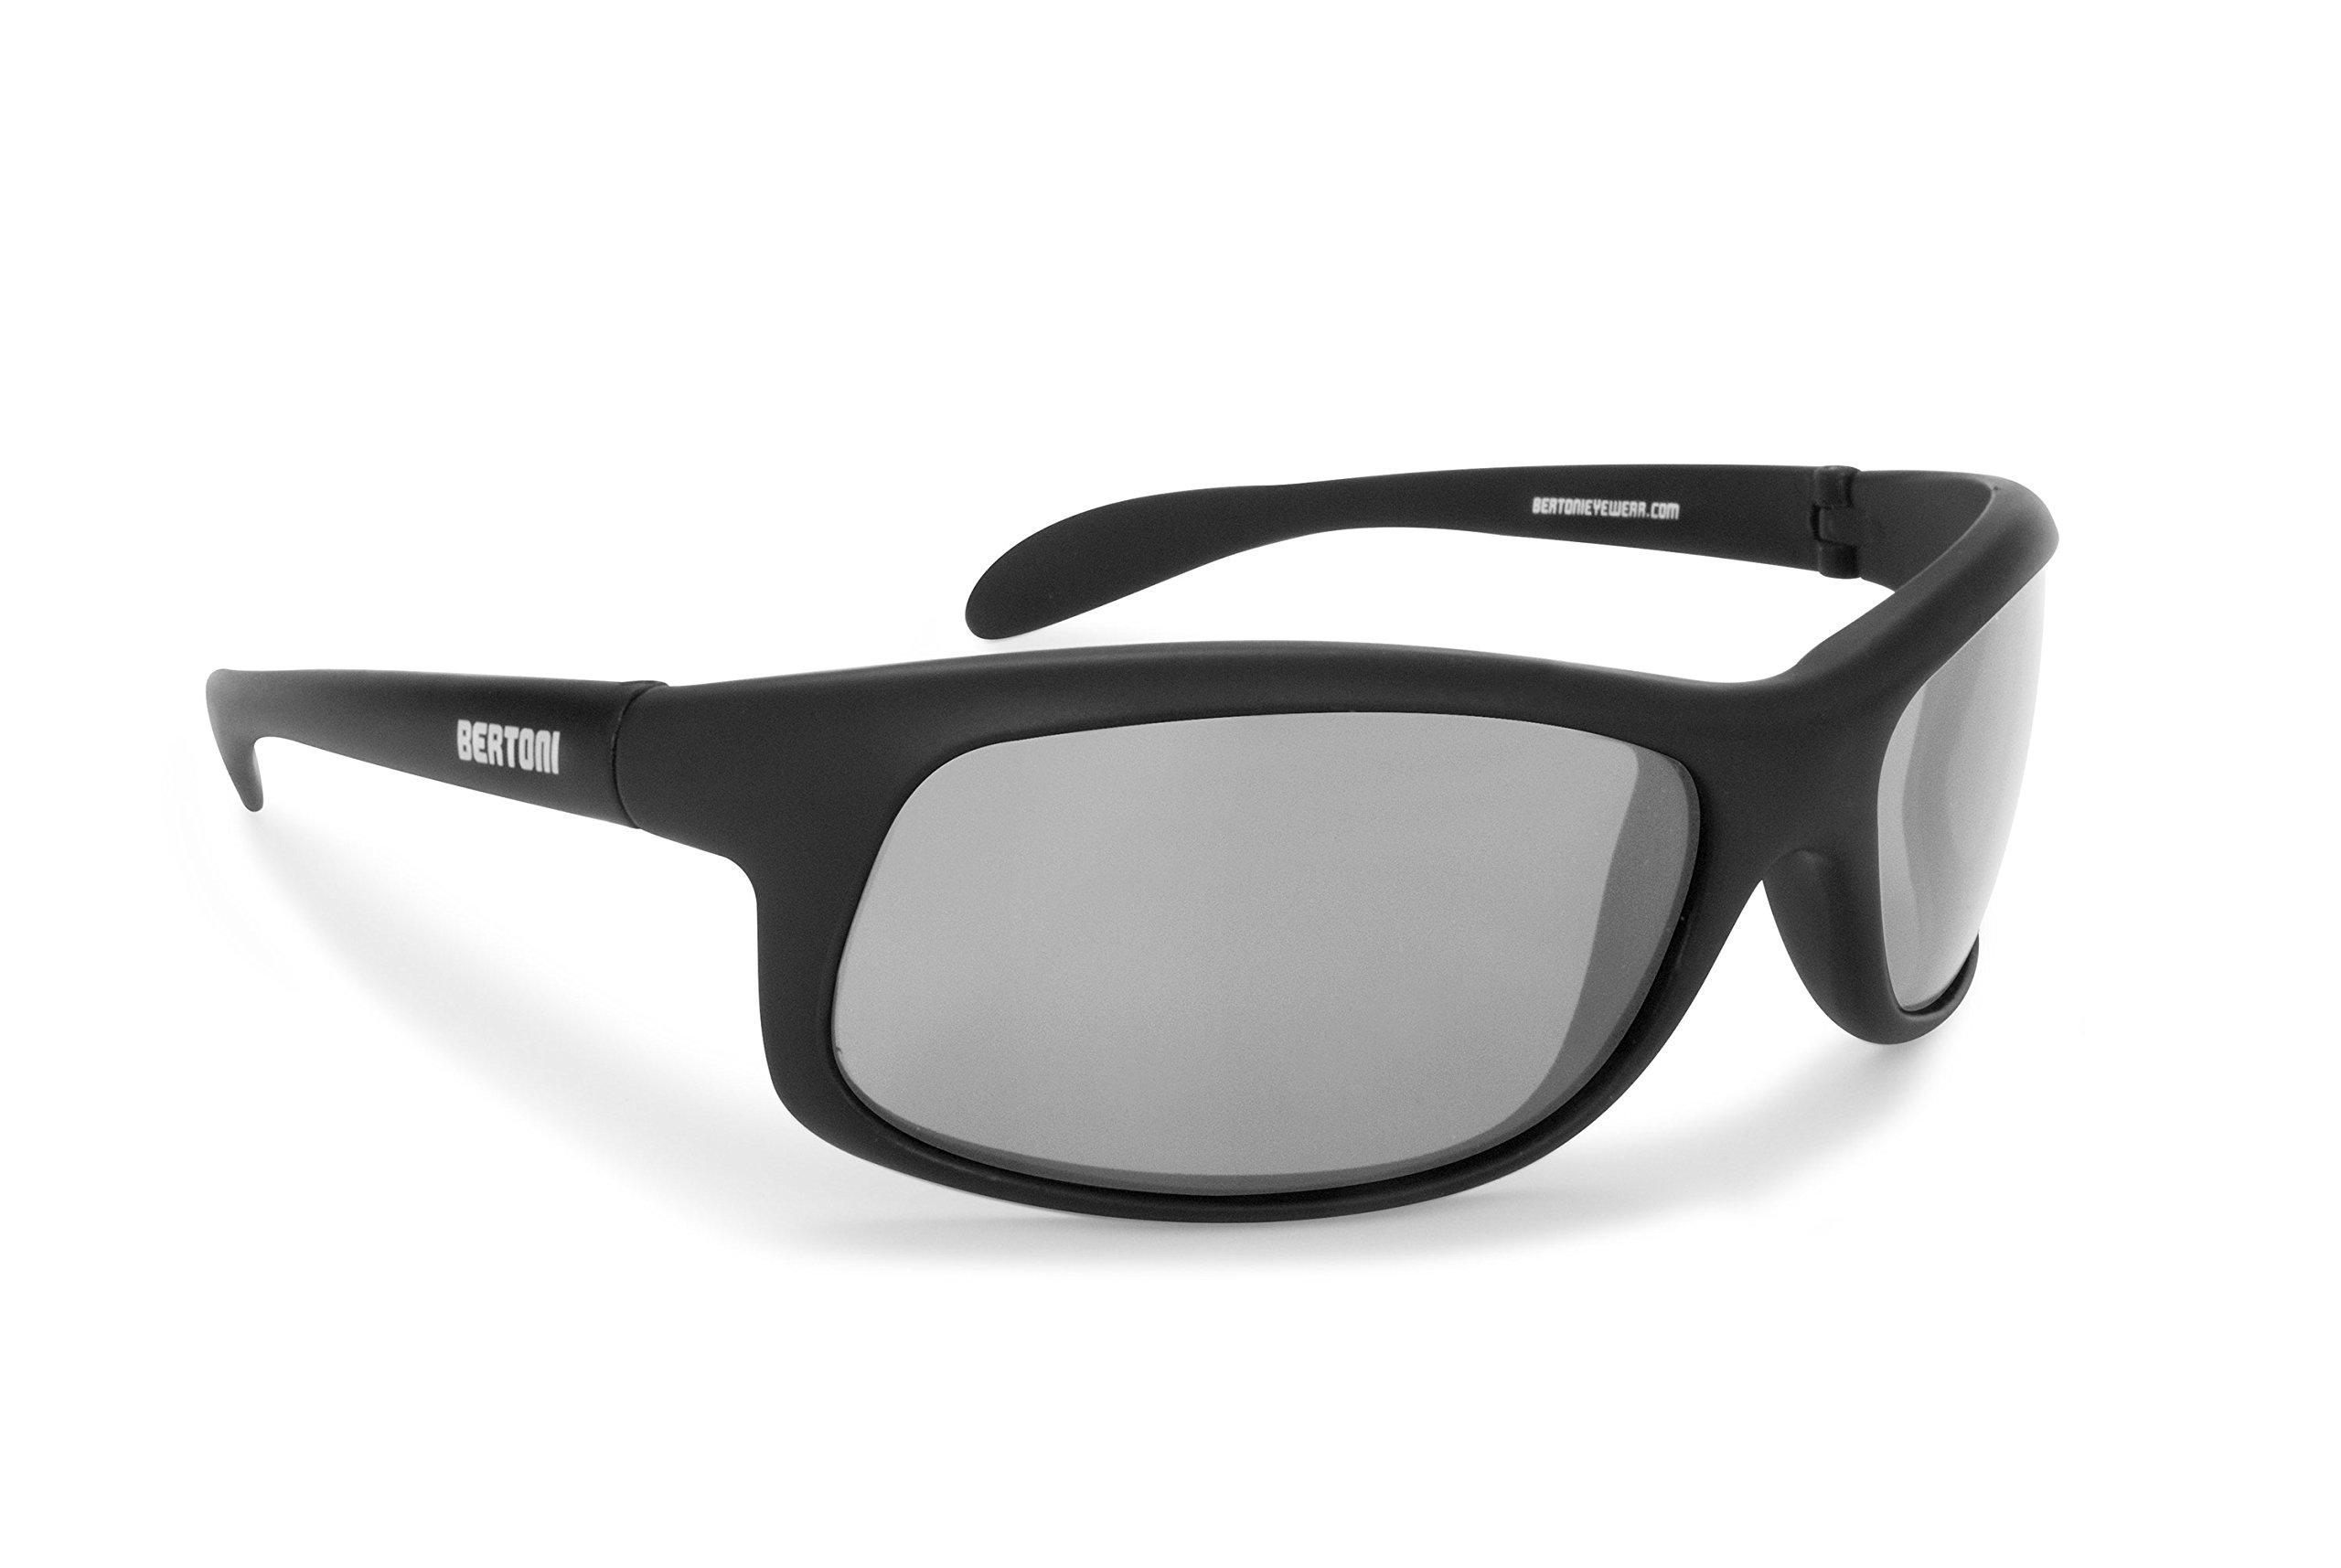 93da6c9f6e1 Get Quotations · Bertoni Photochromic Polarized Sunglasses Cycling Fishing  Watersports Running Ski - P545FT by Bertoni Italy - Sporting